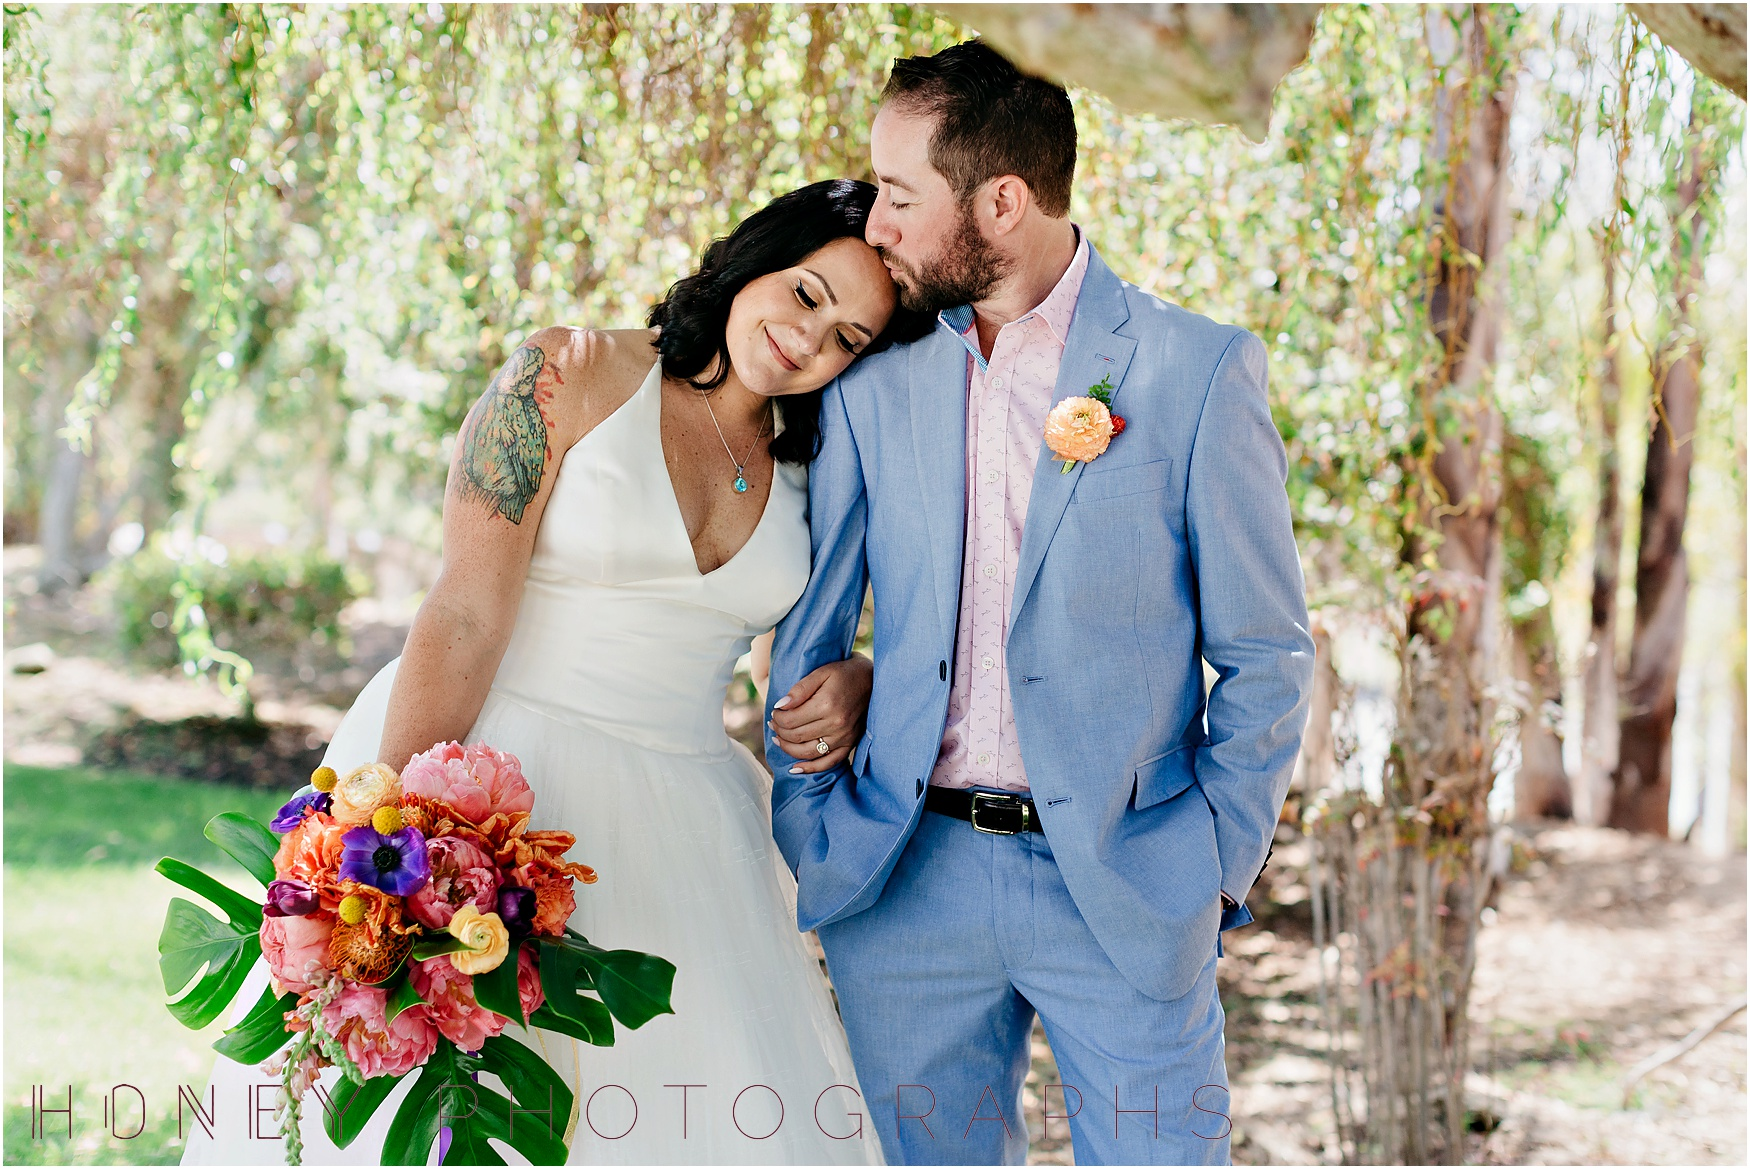 colorful_ecclectic_vibrant_vista_rainbow_quirky_wedding034.jpg